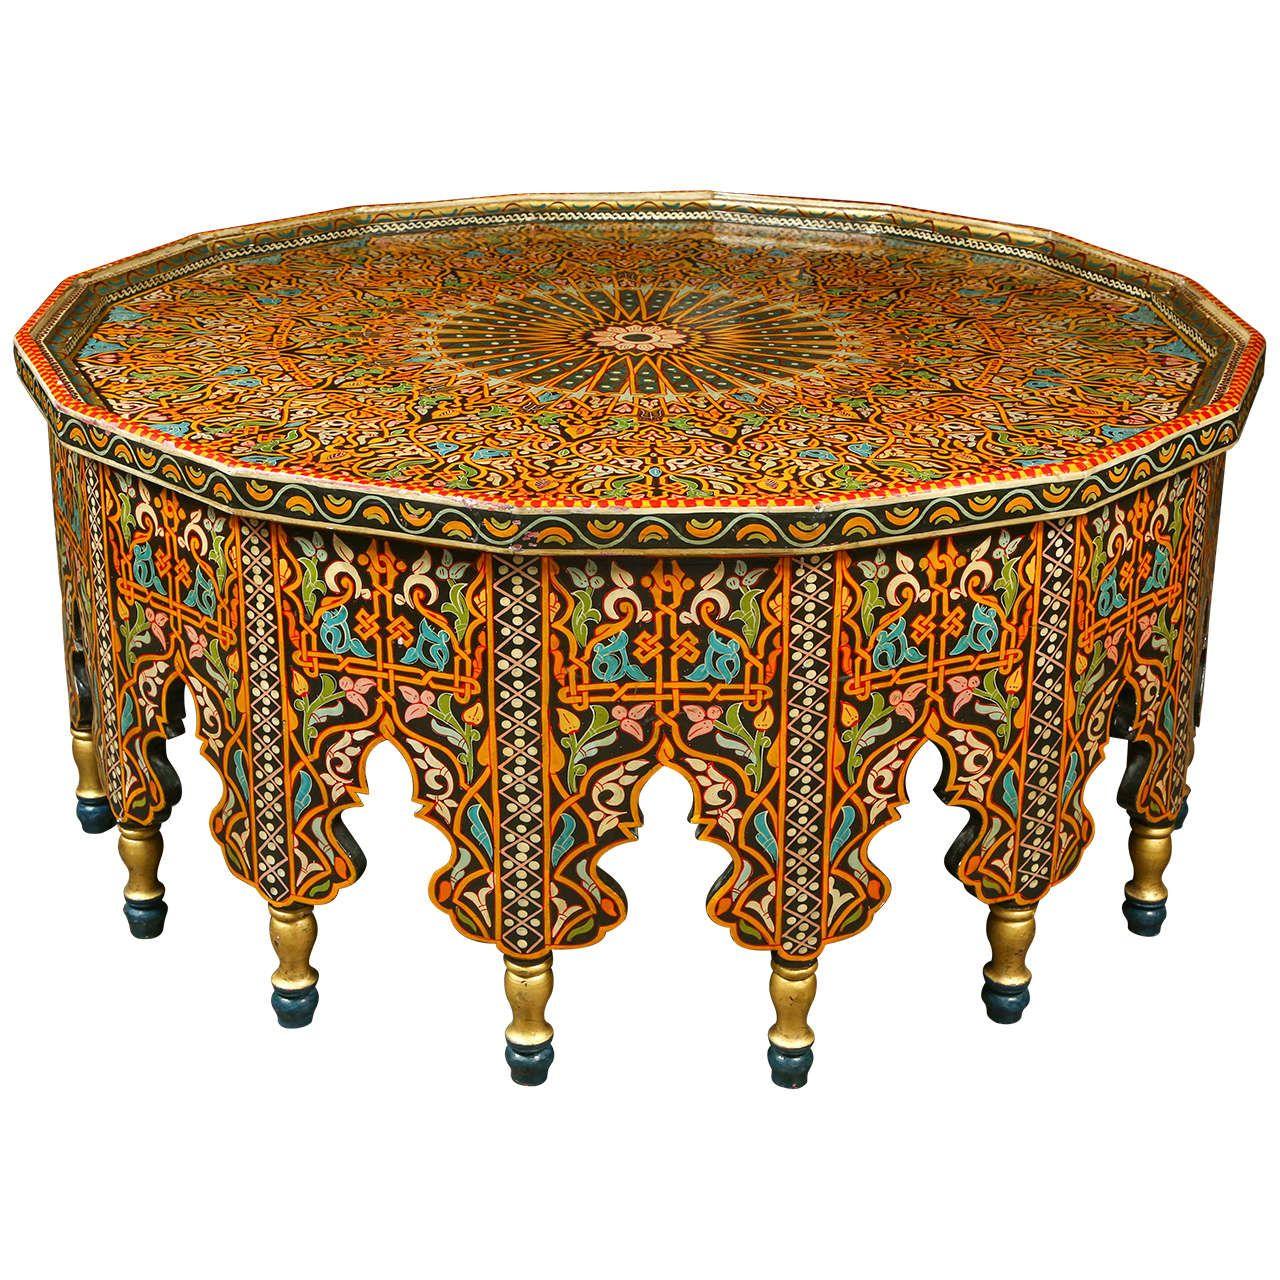 Moroccan Sofa Base Signature Ashley Fabulous Coffee Table Diy Home Bedroom